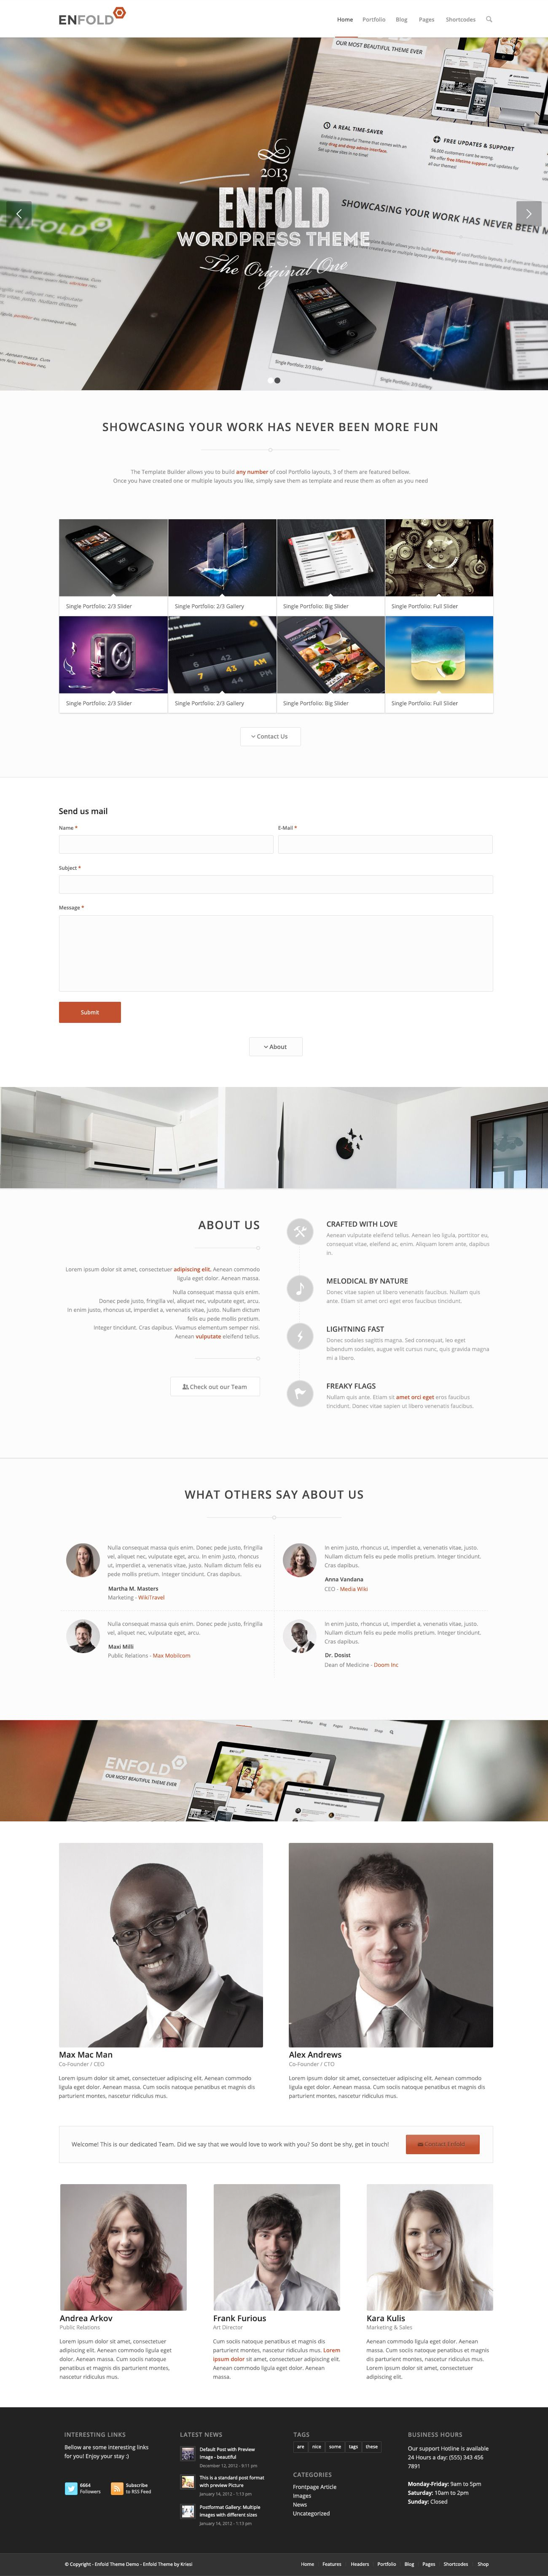 Enfold Responsive MultiPurpose Theme Corporate web